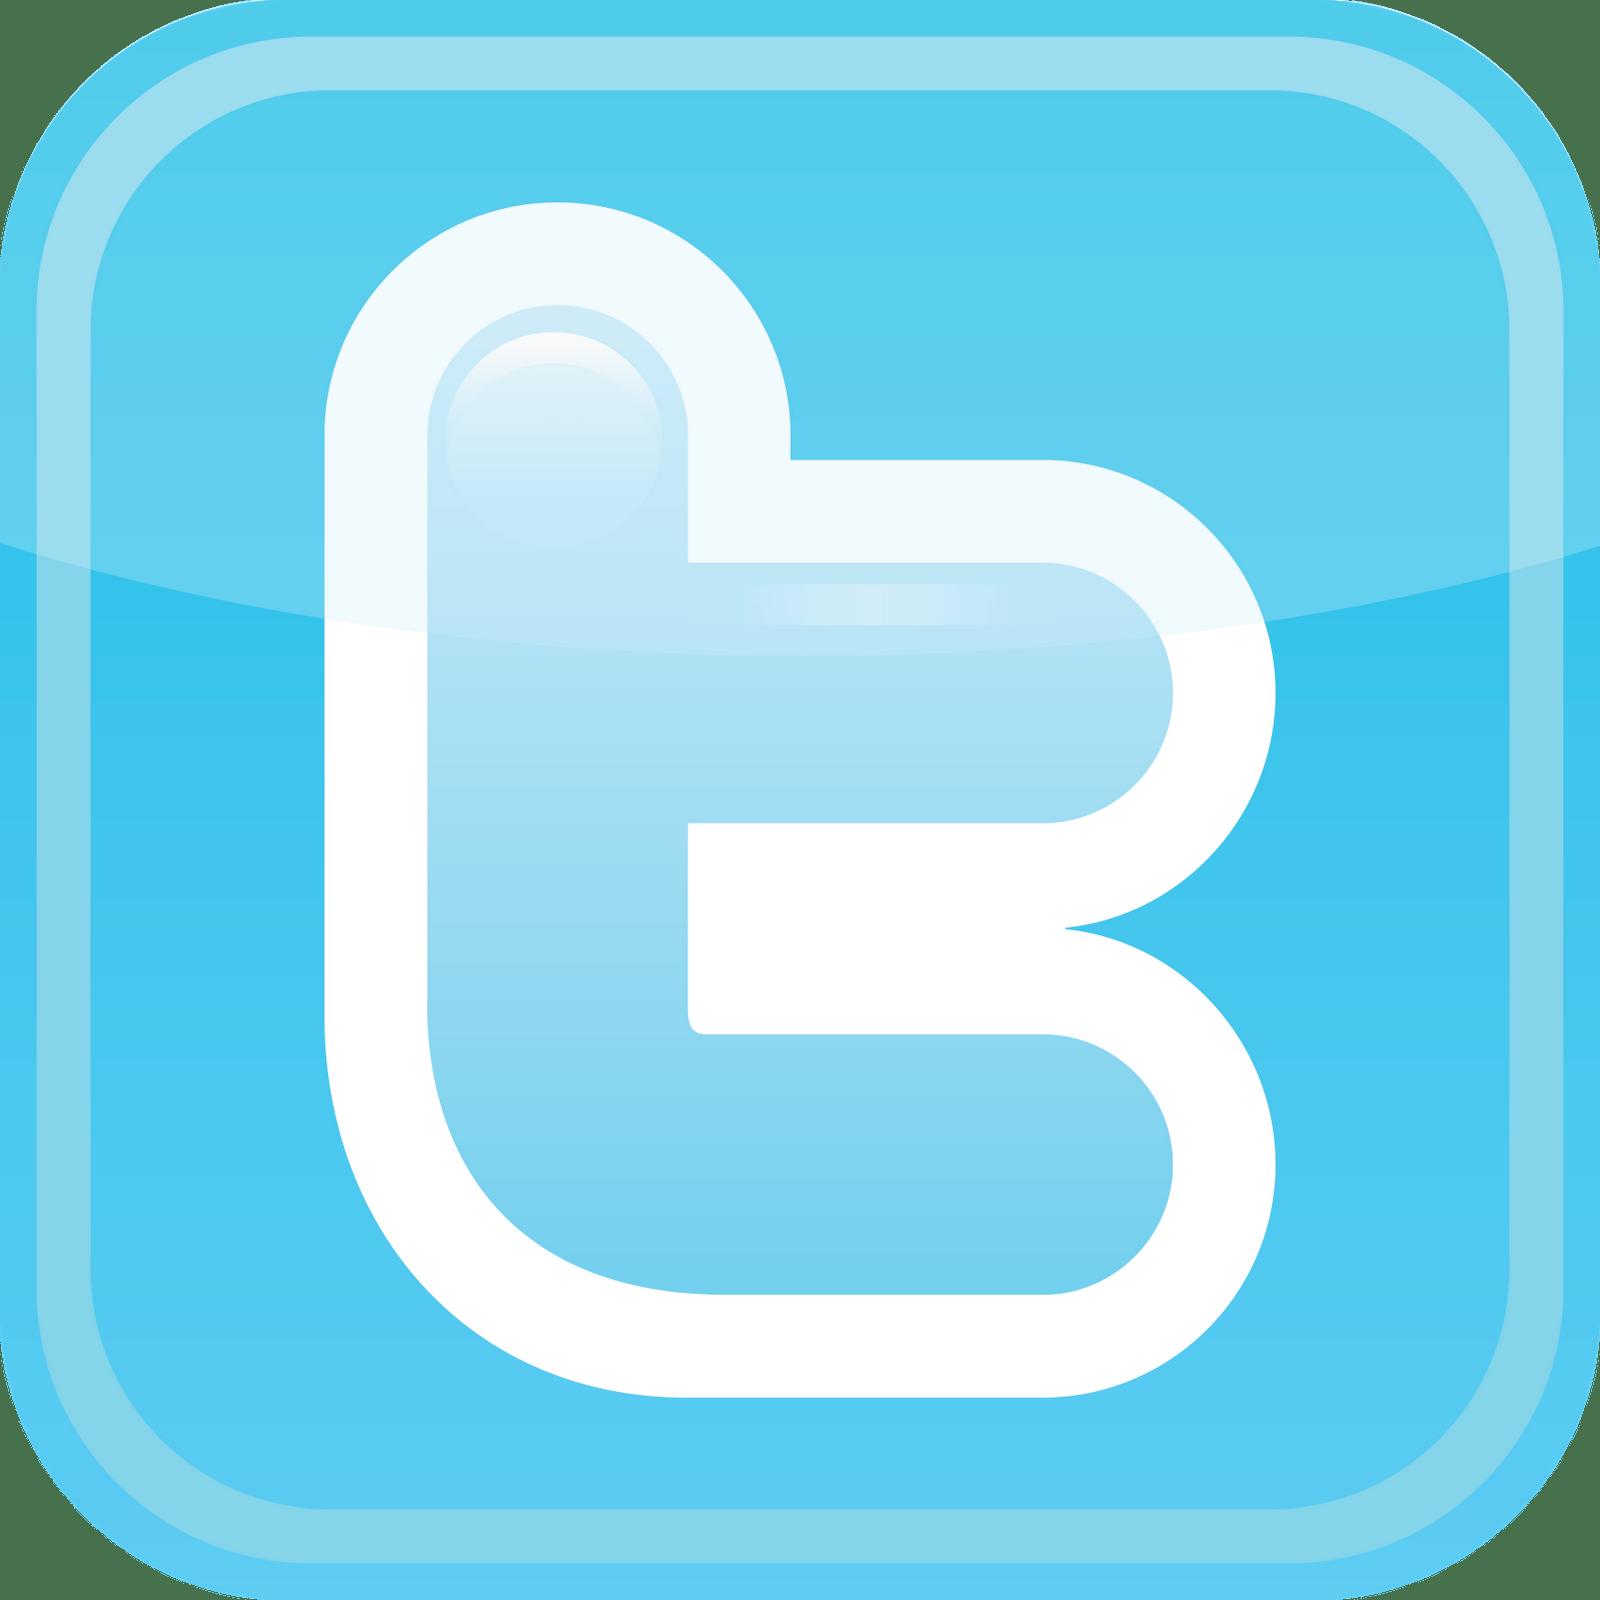 1600x1600 Facebook Twitter Instagram Logo Download